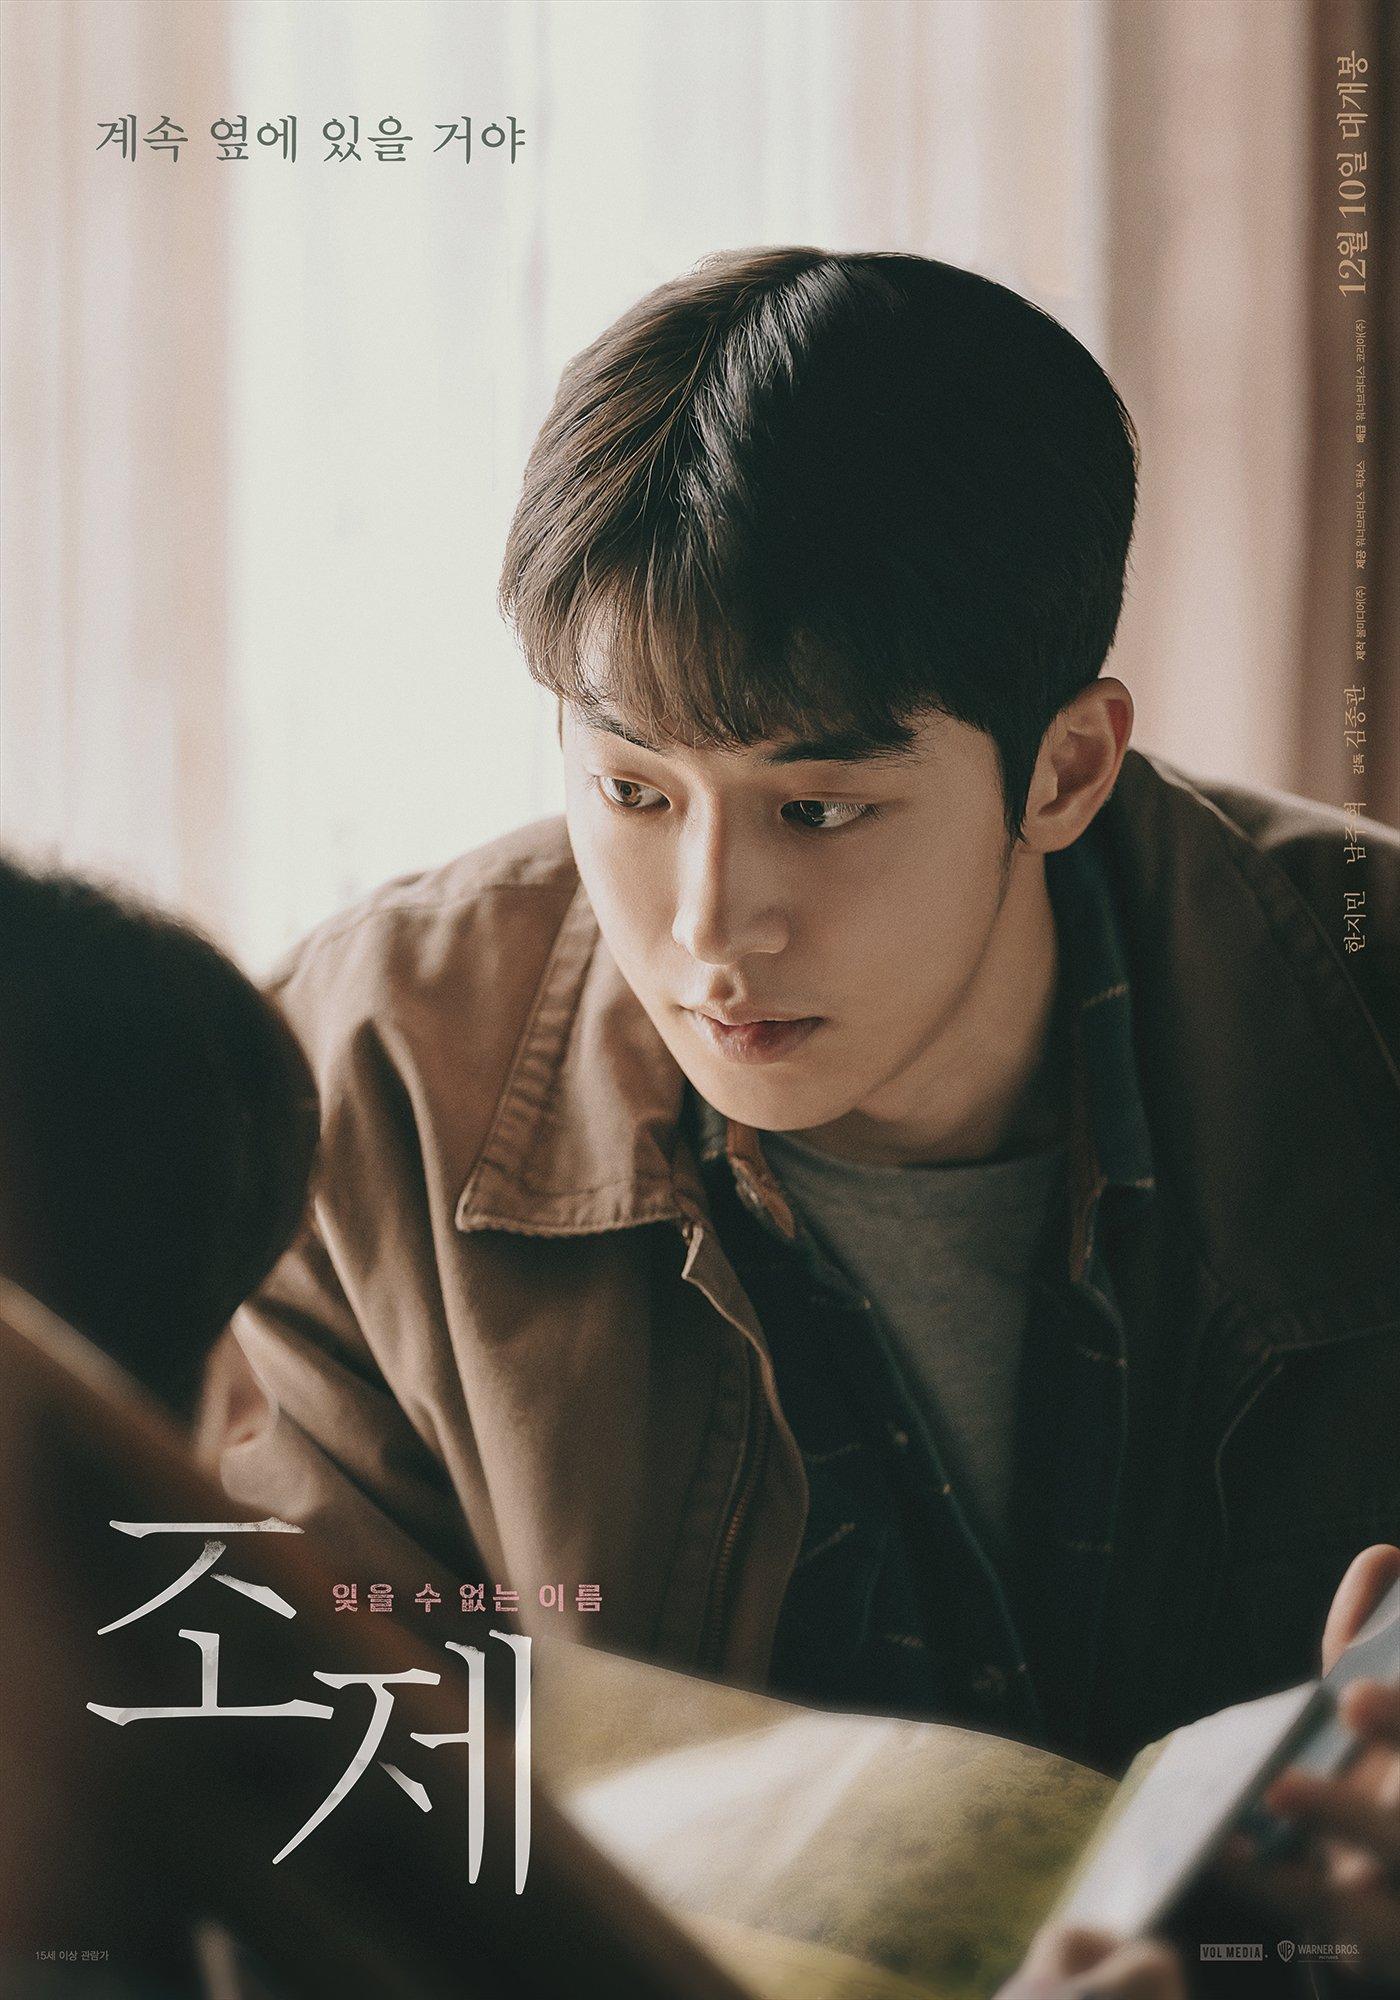 """Josee"": Nam Joo Hyuk and Han Ji Min's upcoming film sets premiere date"